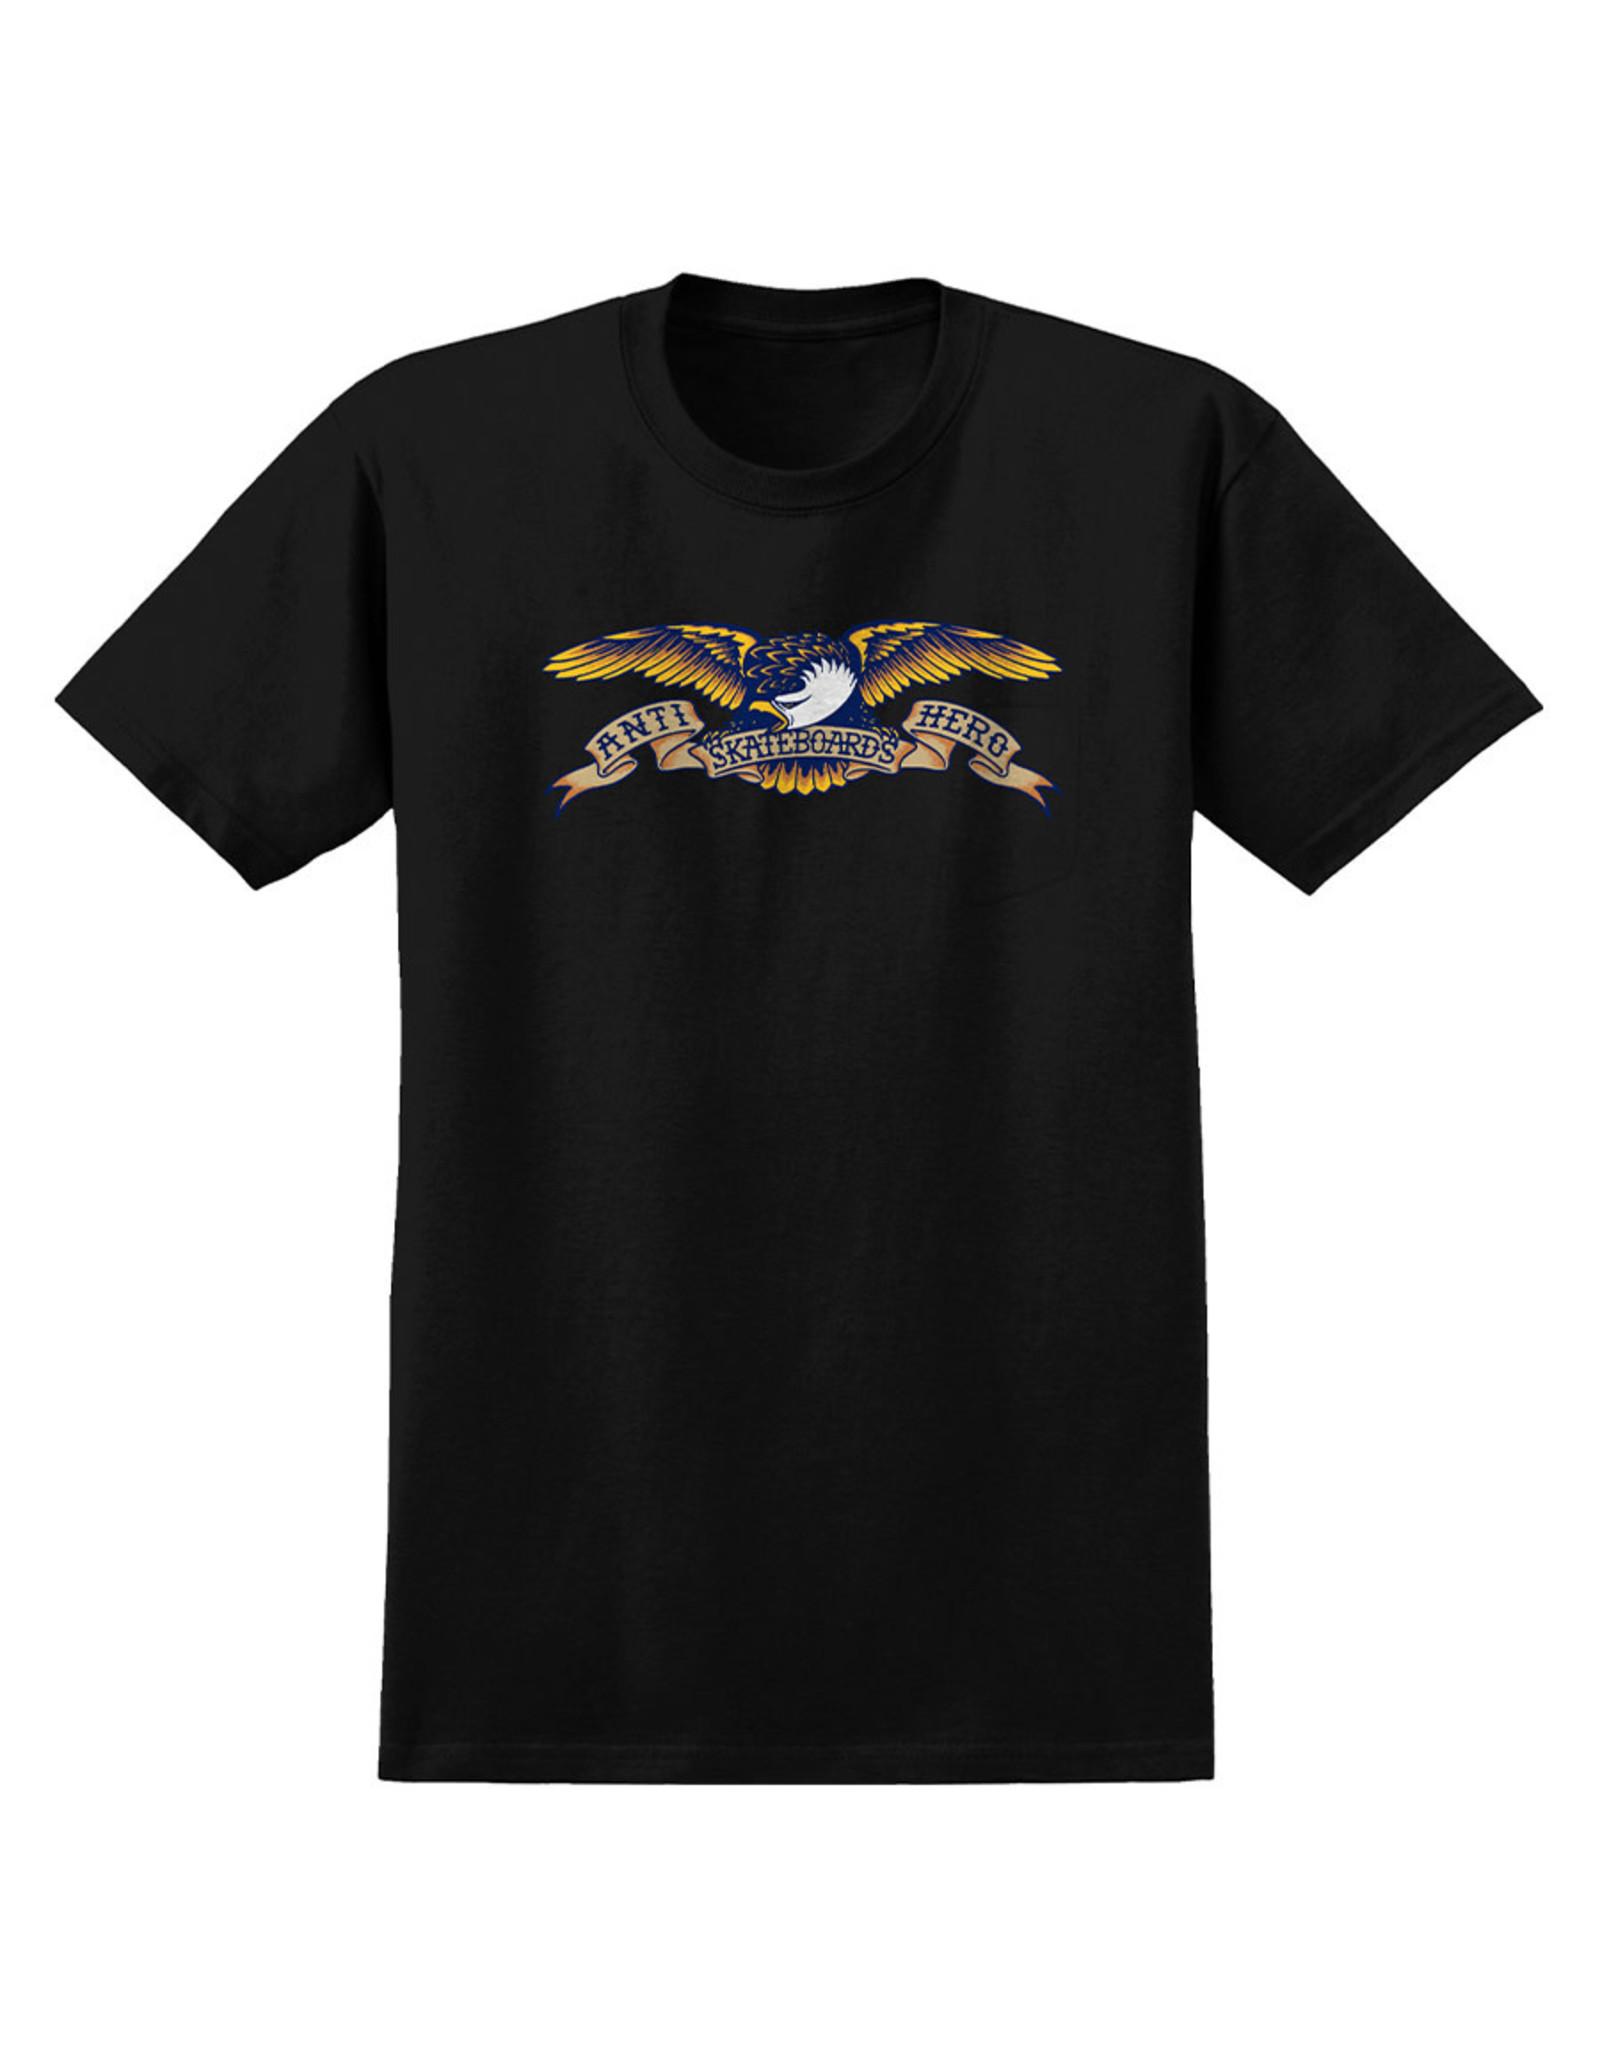 Anti Hero Anti Hero Tee Basic Eagle S/S (Black/Yellow)